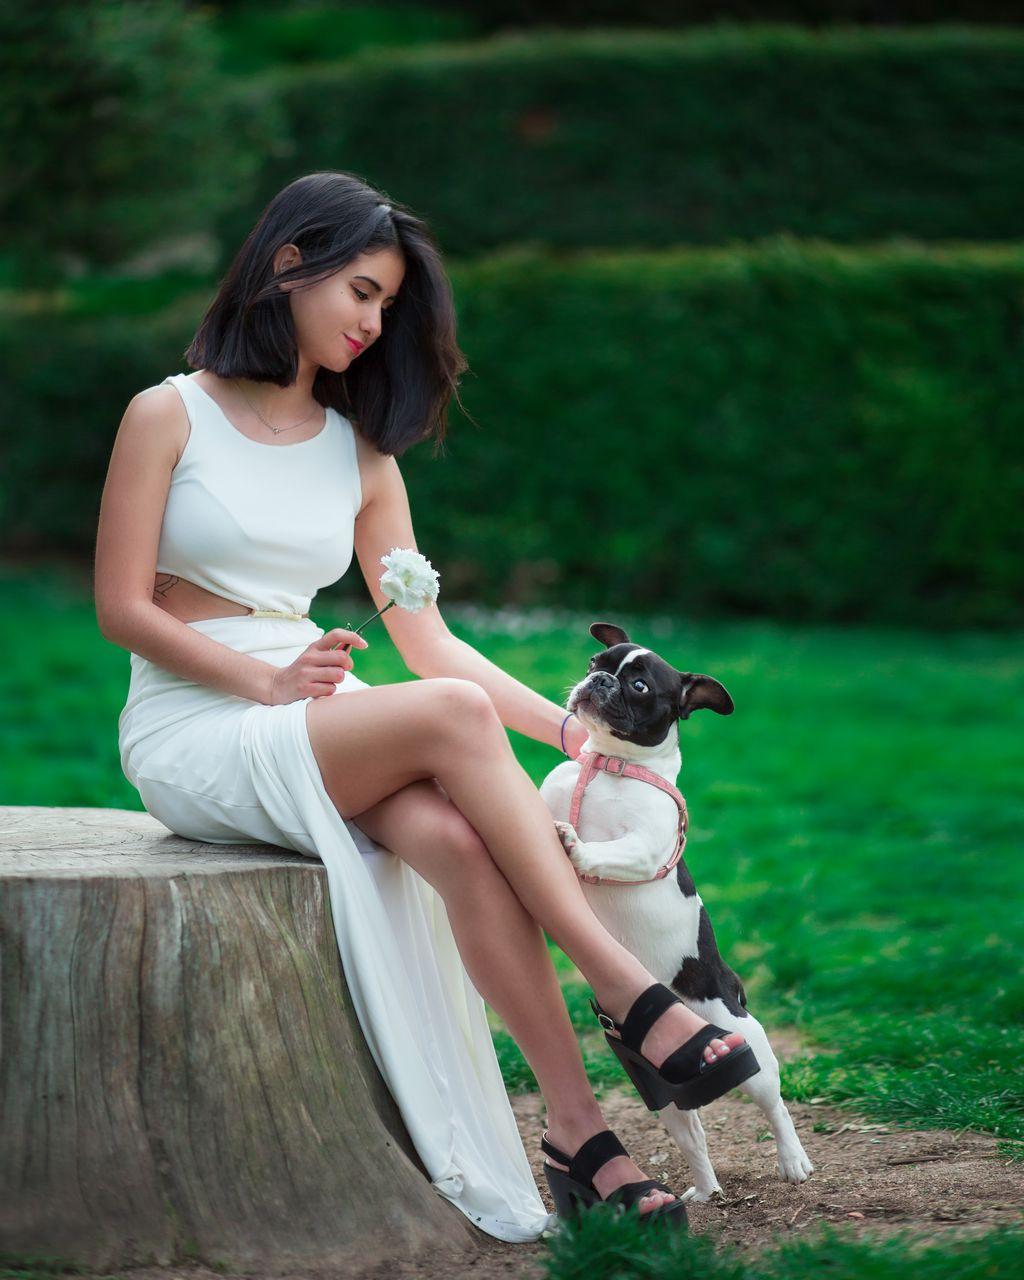 Woman With Dog Sitting On Tree Stump